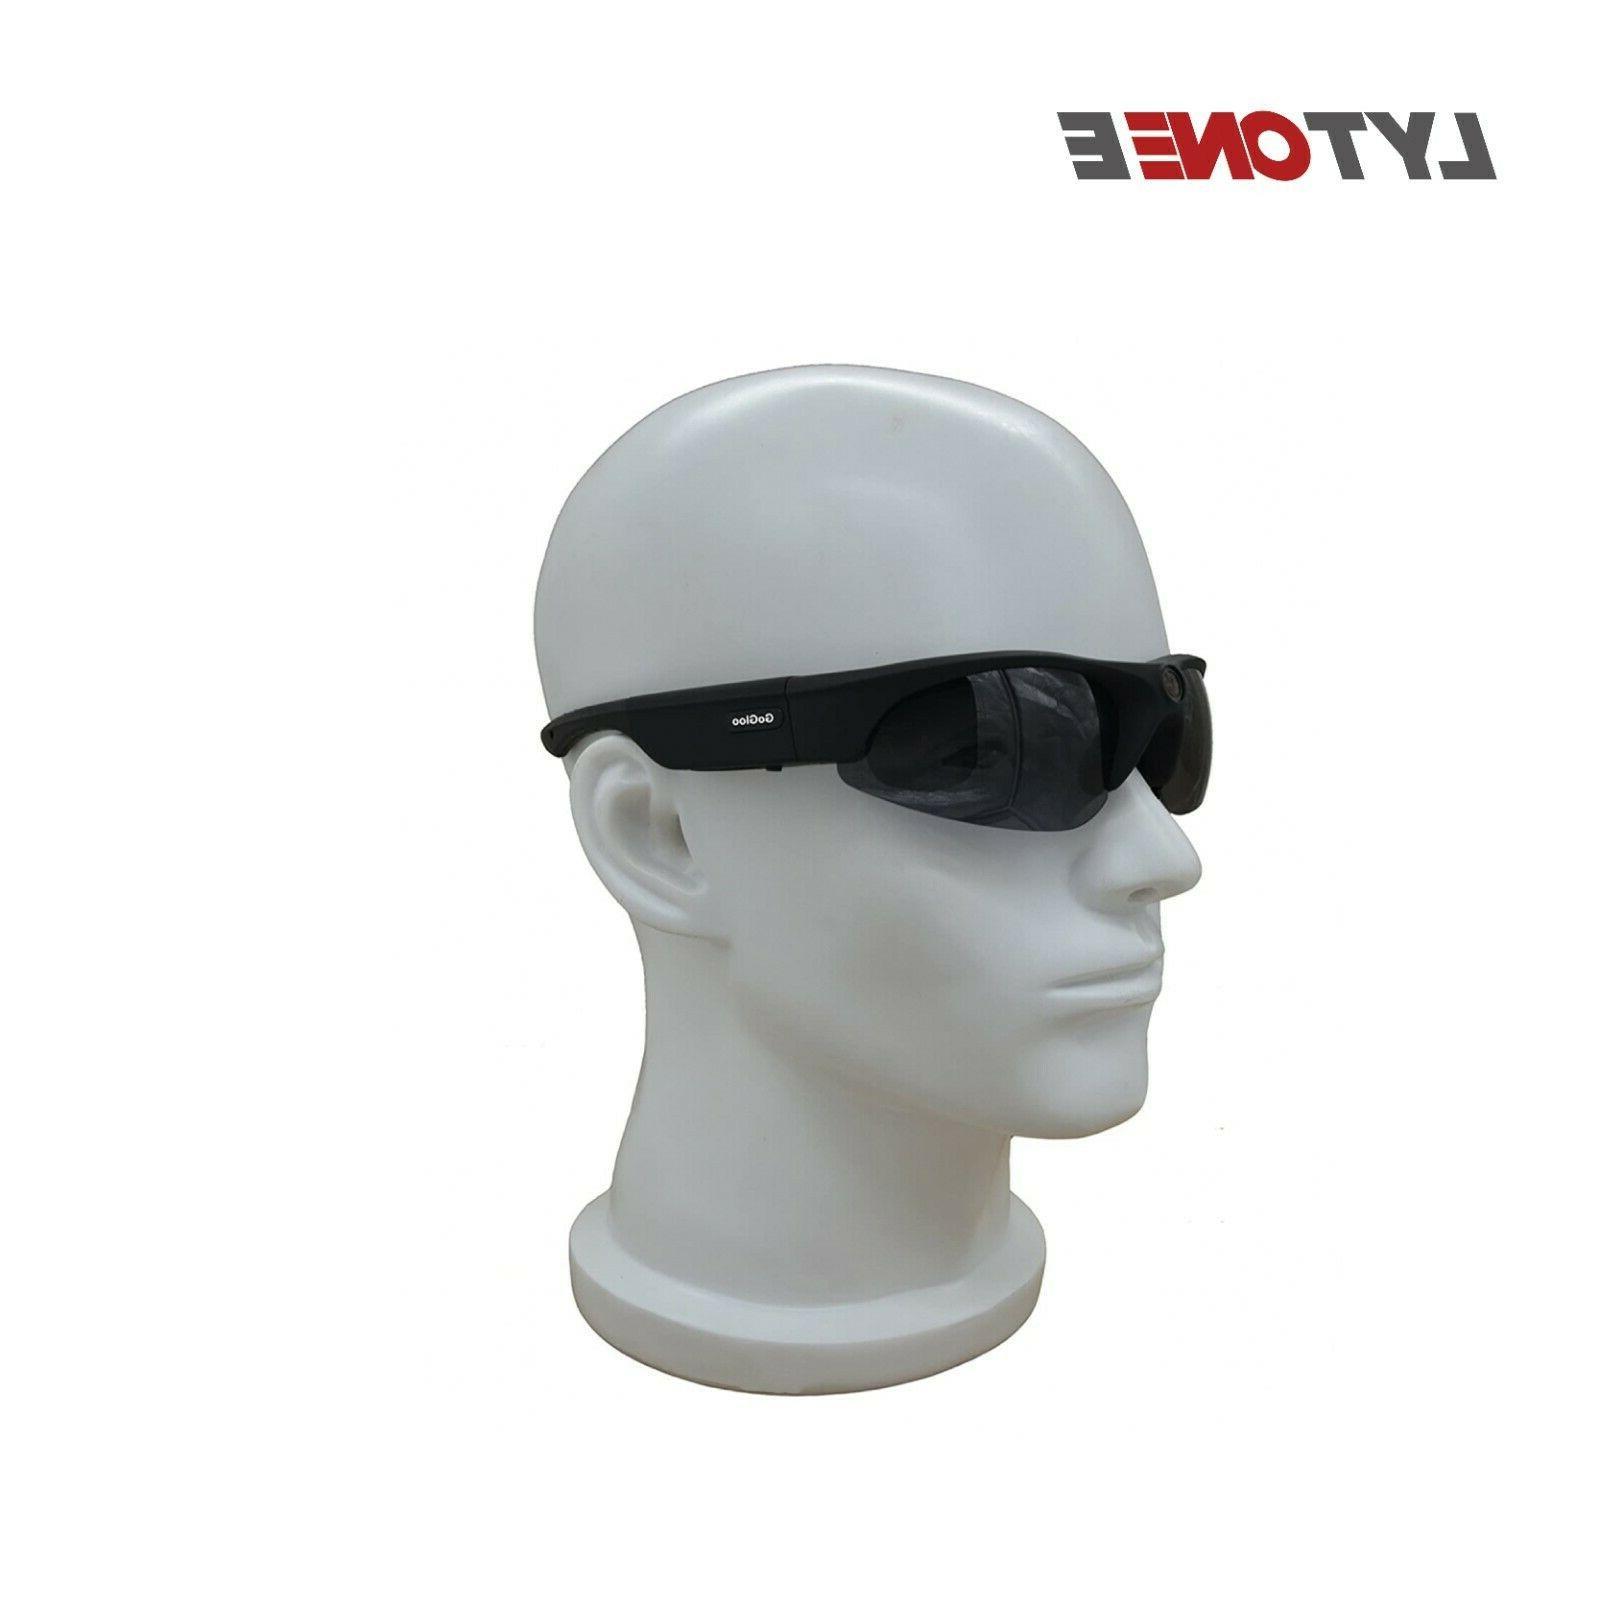 HD Eye Glasses Camera DVR Camera 30fps 150